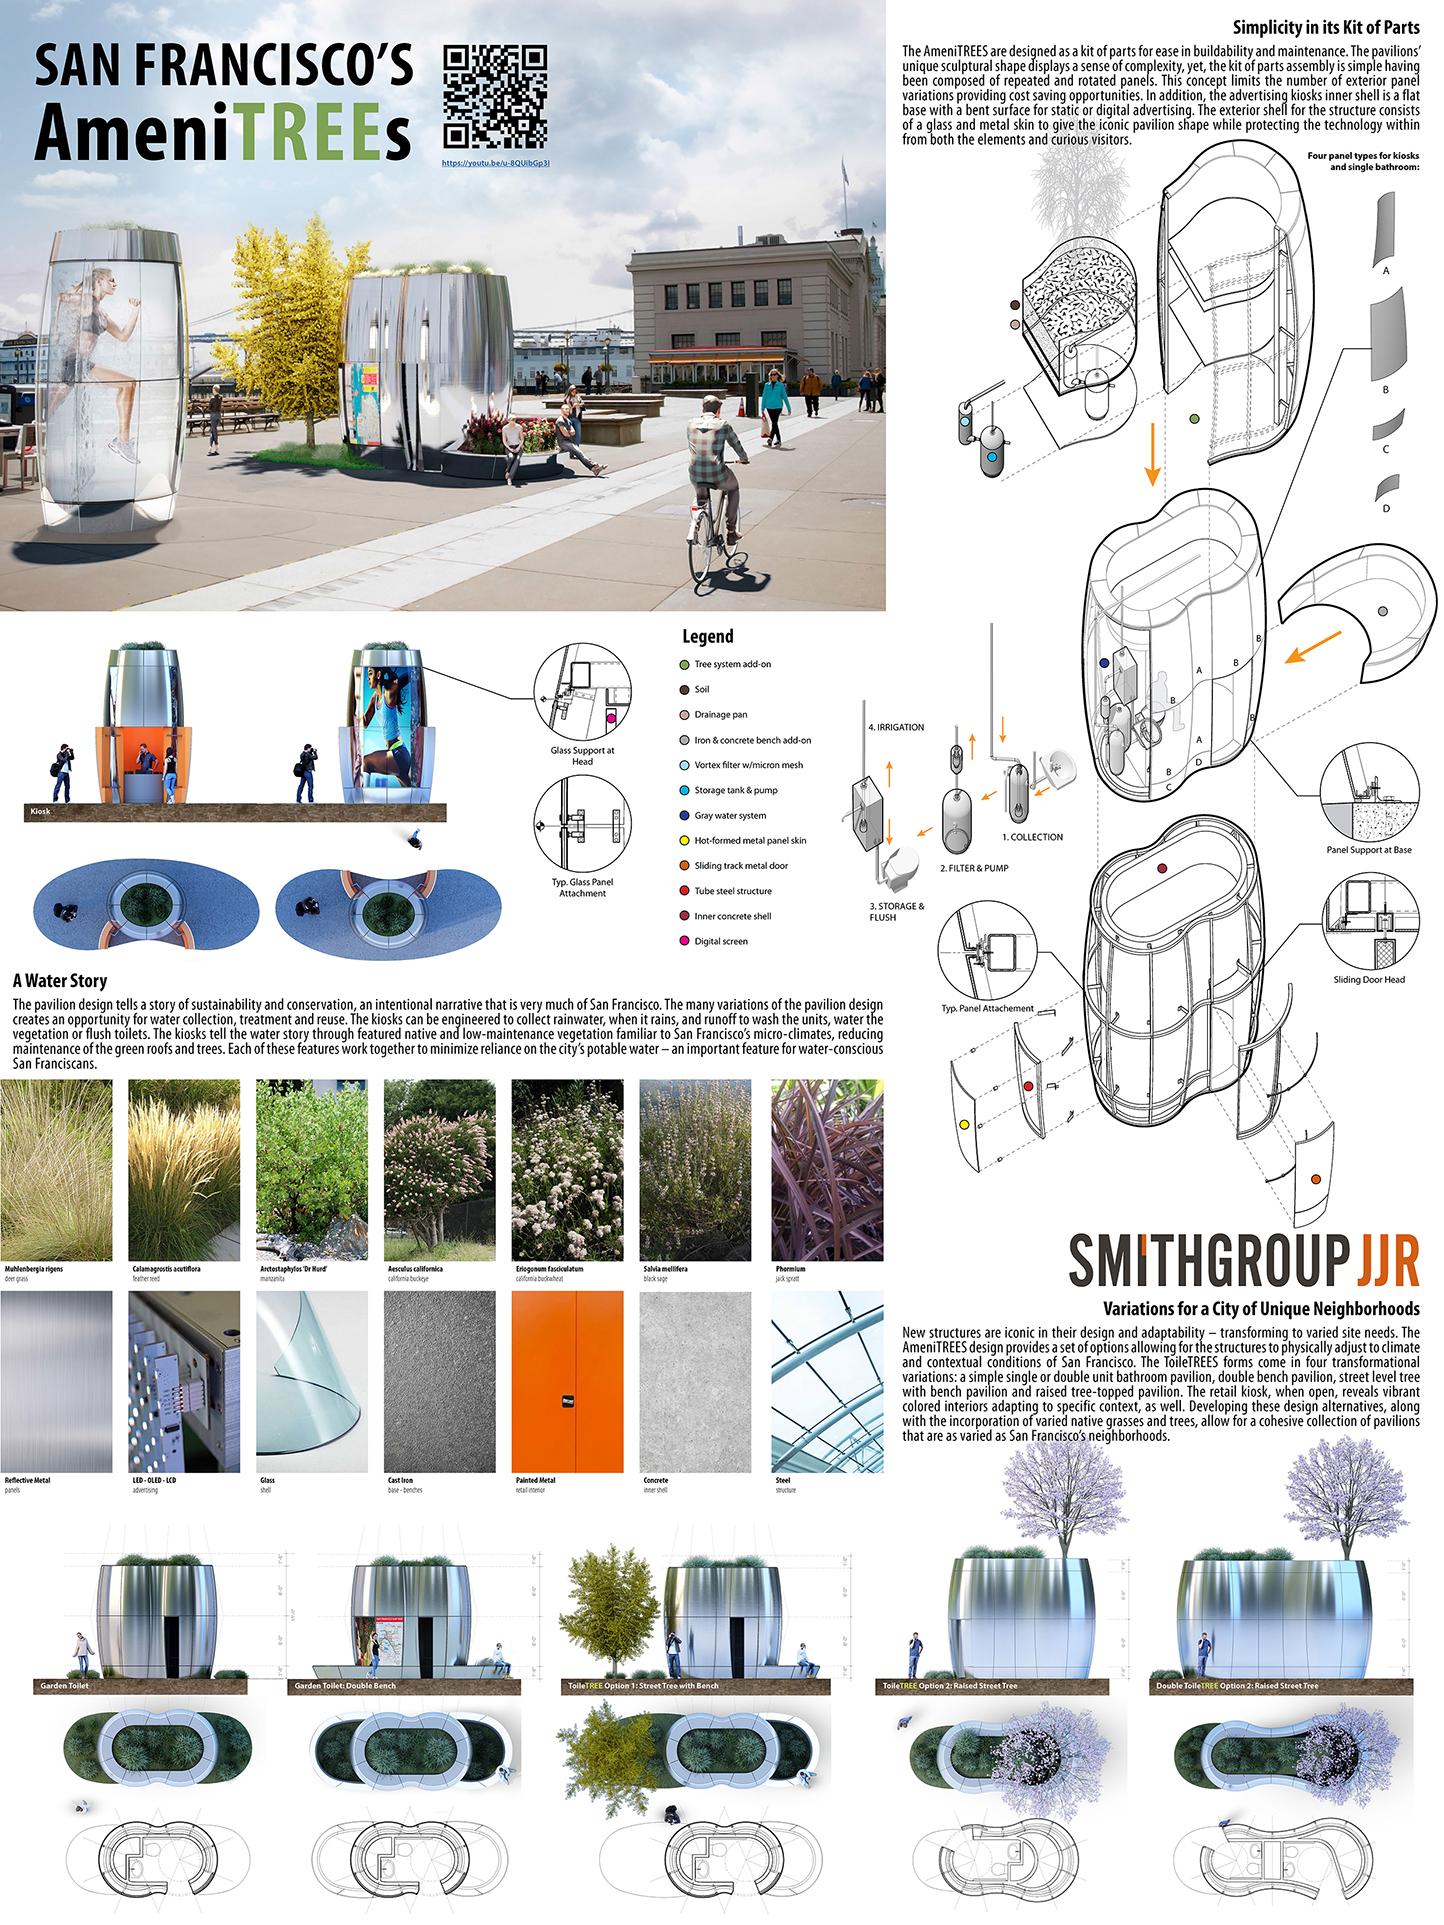 SmithGroupJJR_JCDecauxSFPublicWorks_competition_BOARD02_web2.jpg